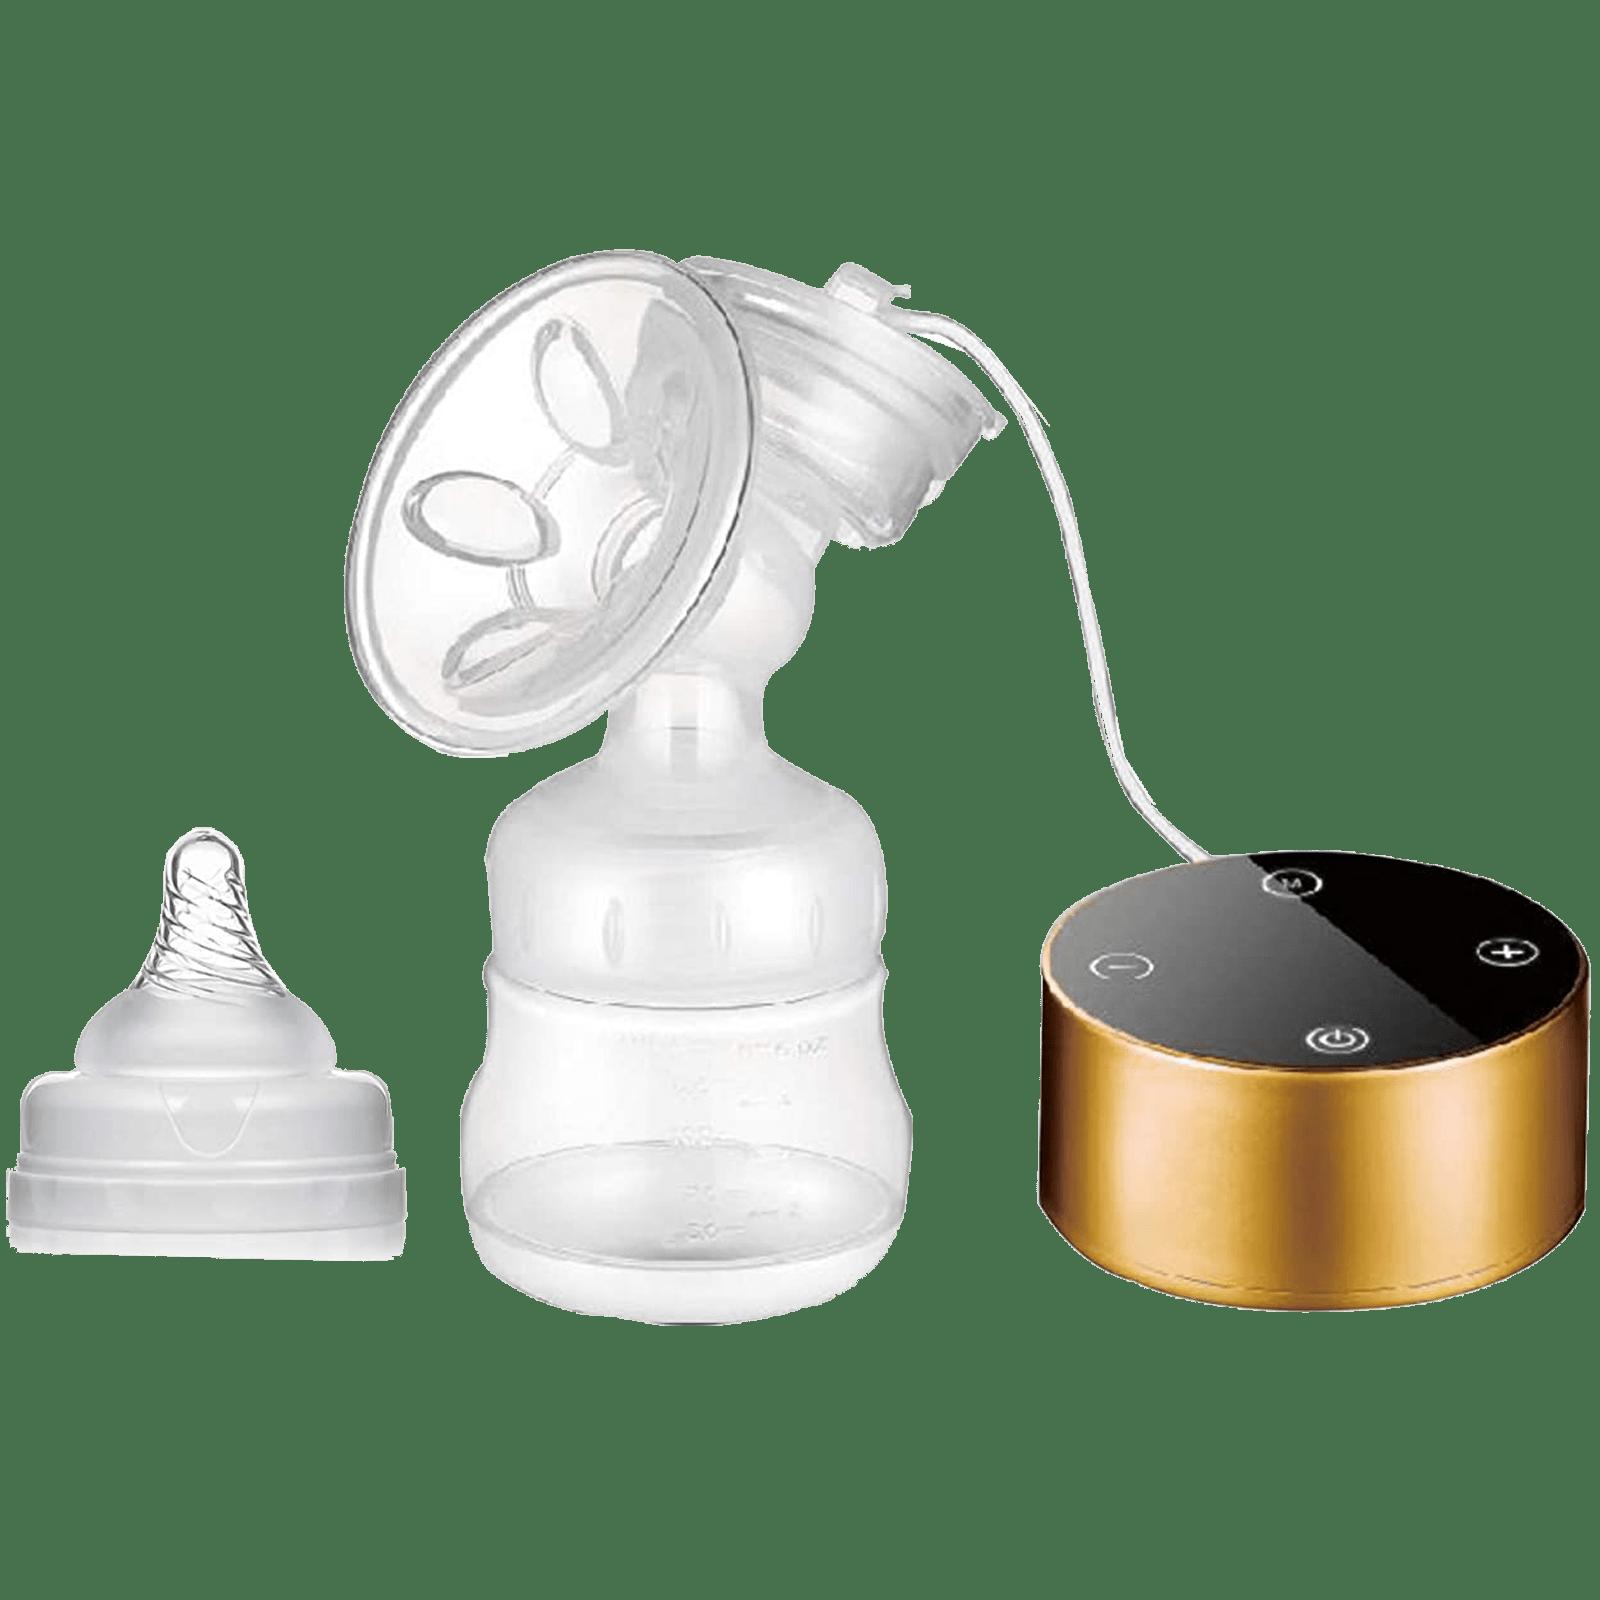 Dr. Odin Breast Pump (100 Percent Sterilisable, OD-302, Gold)